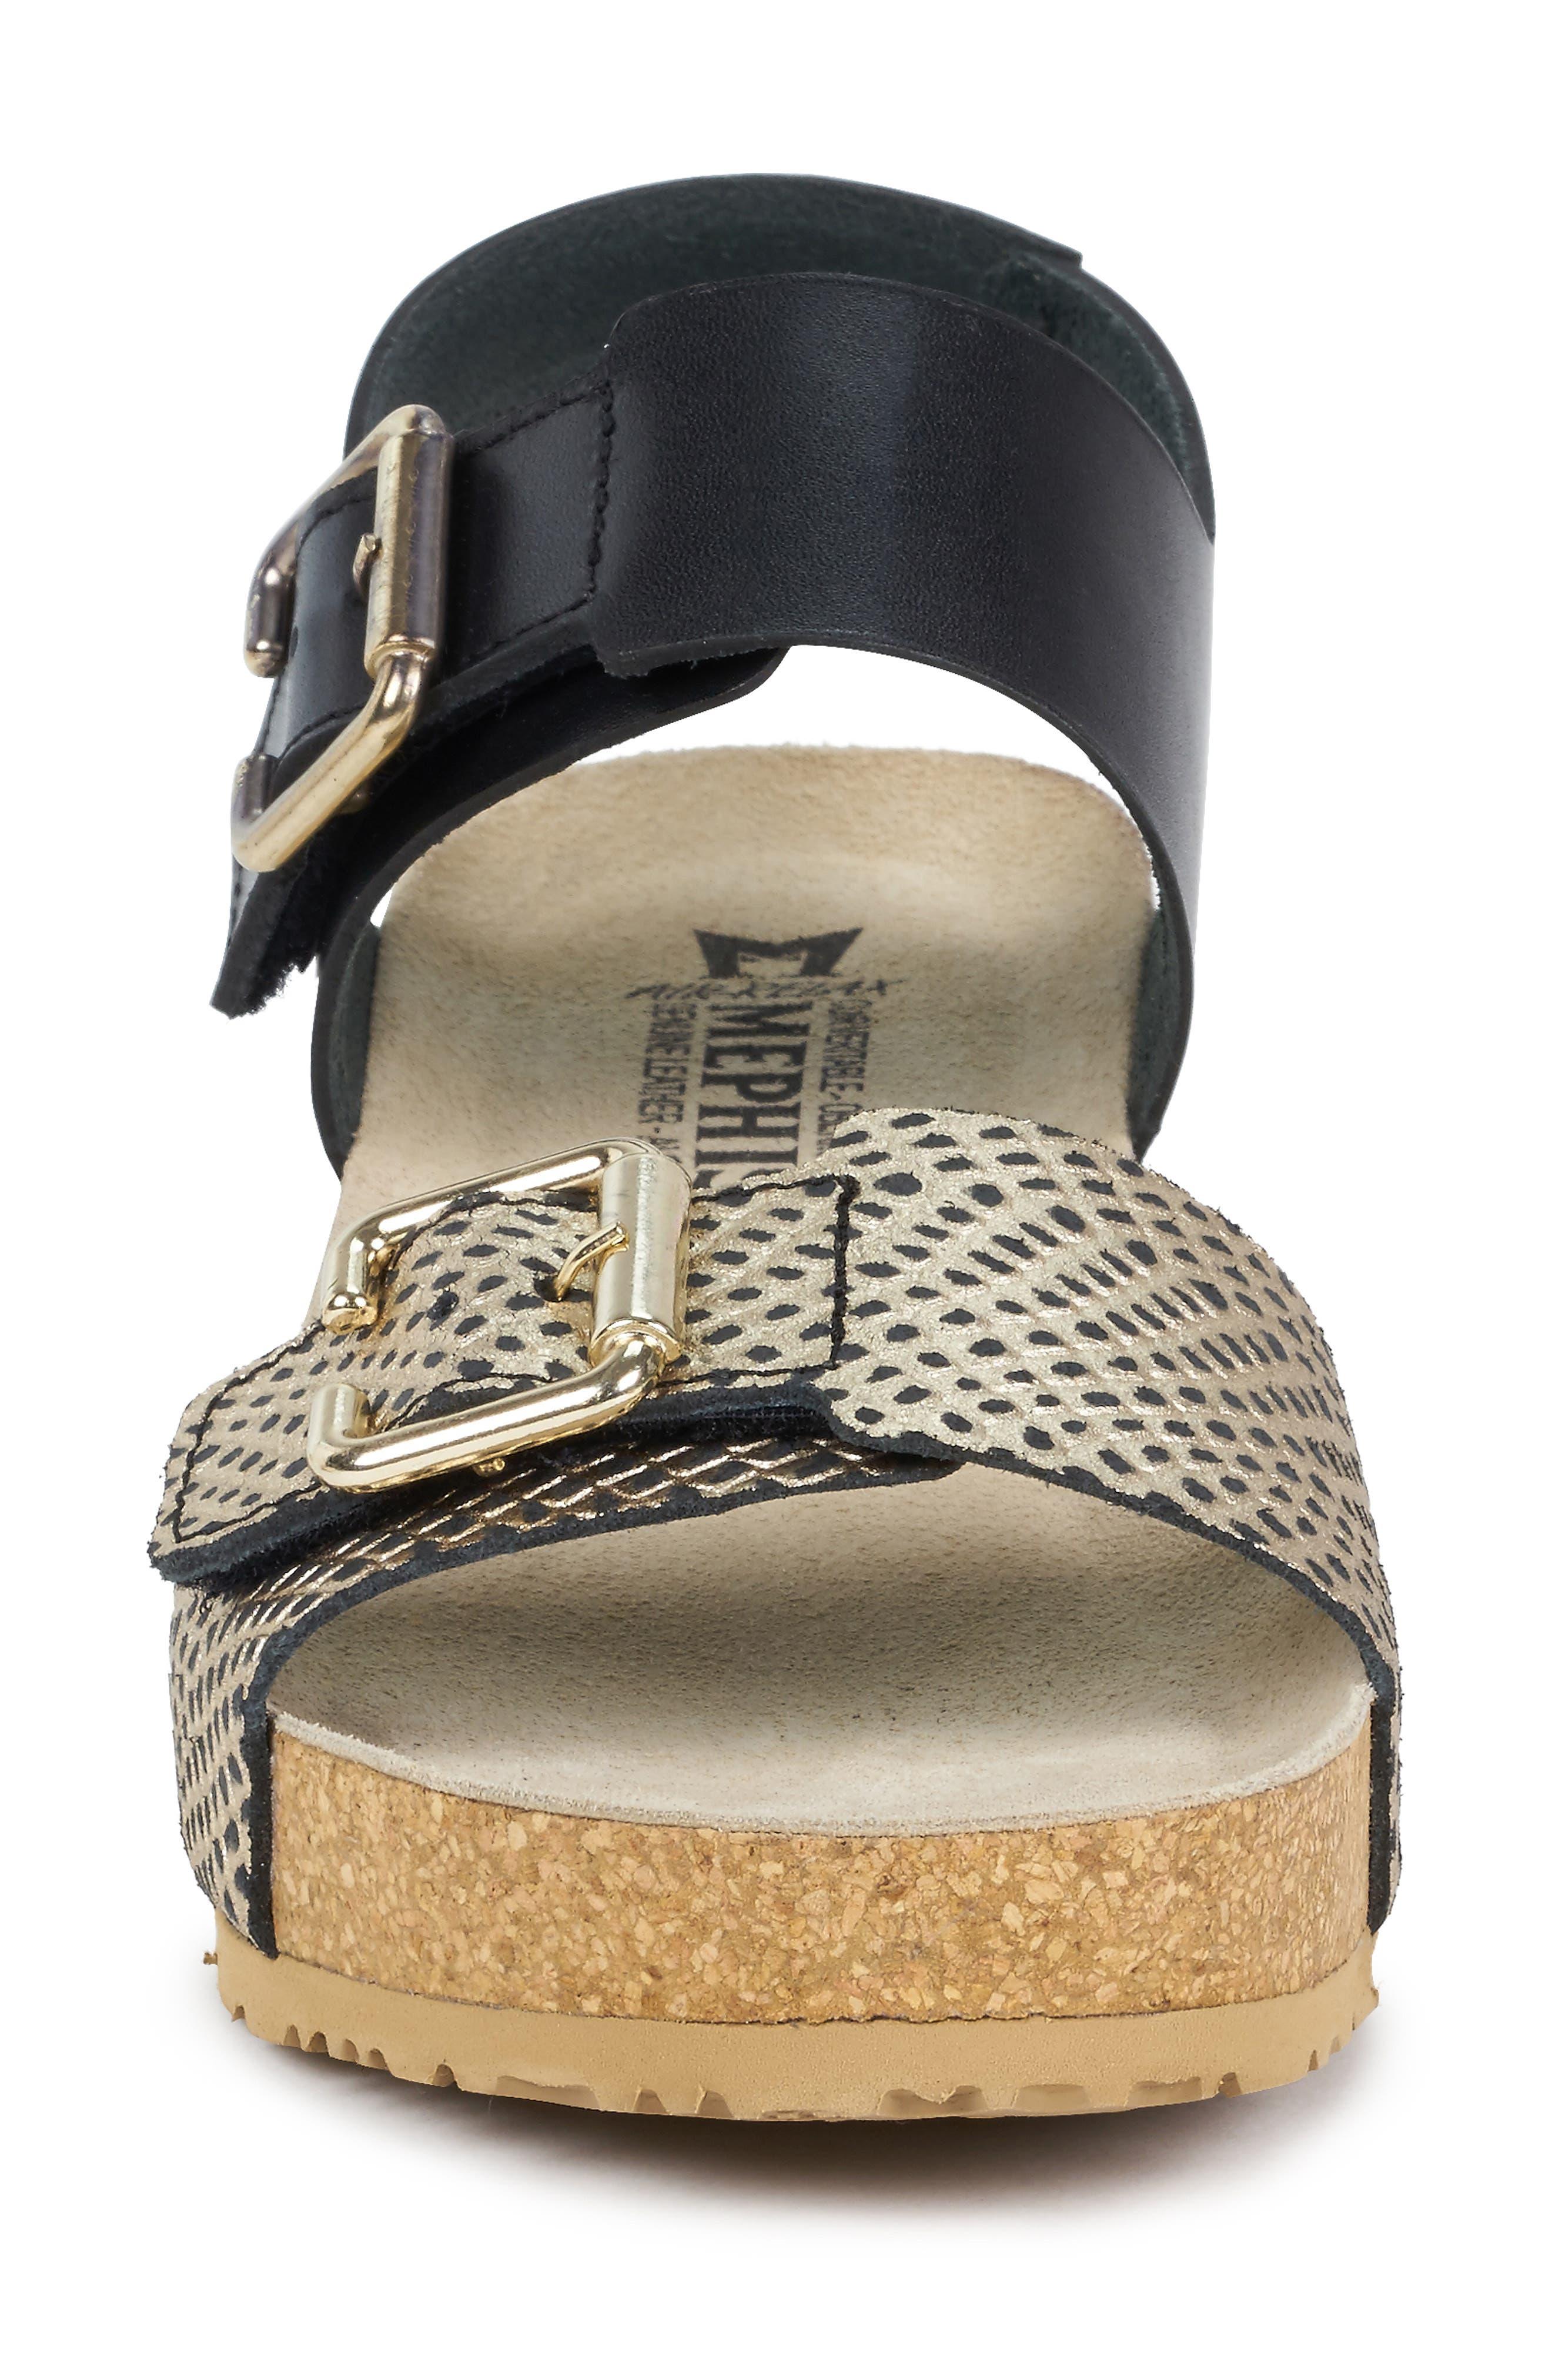 Lissandra Platform Wedge Sandal,                             Alternate thumbnail 4, color,                             BLACK/ GOLD LEATHER